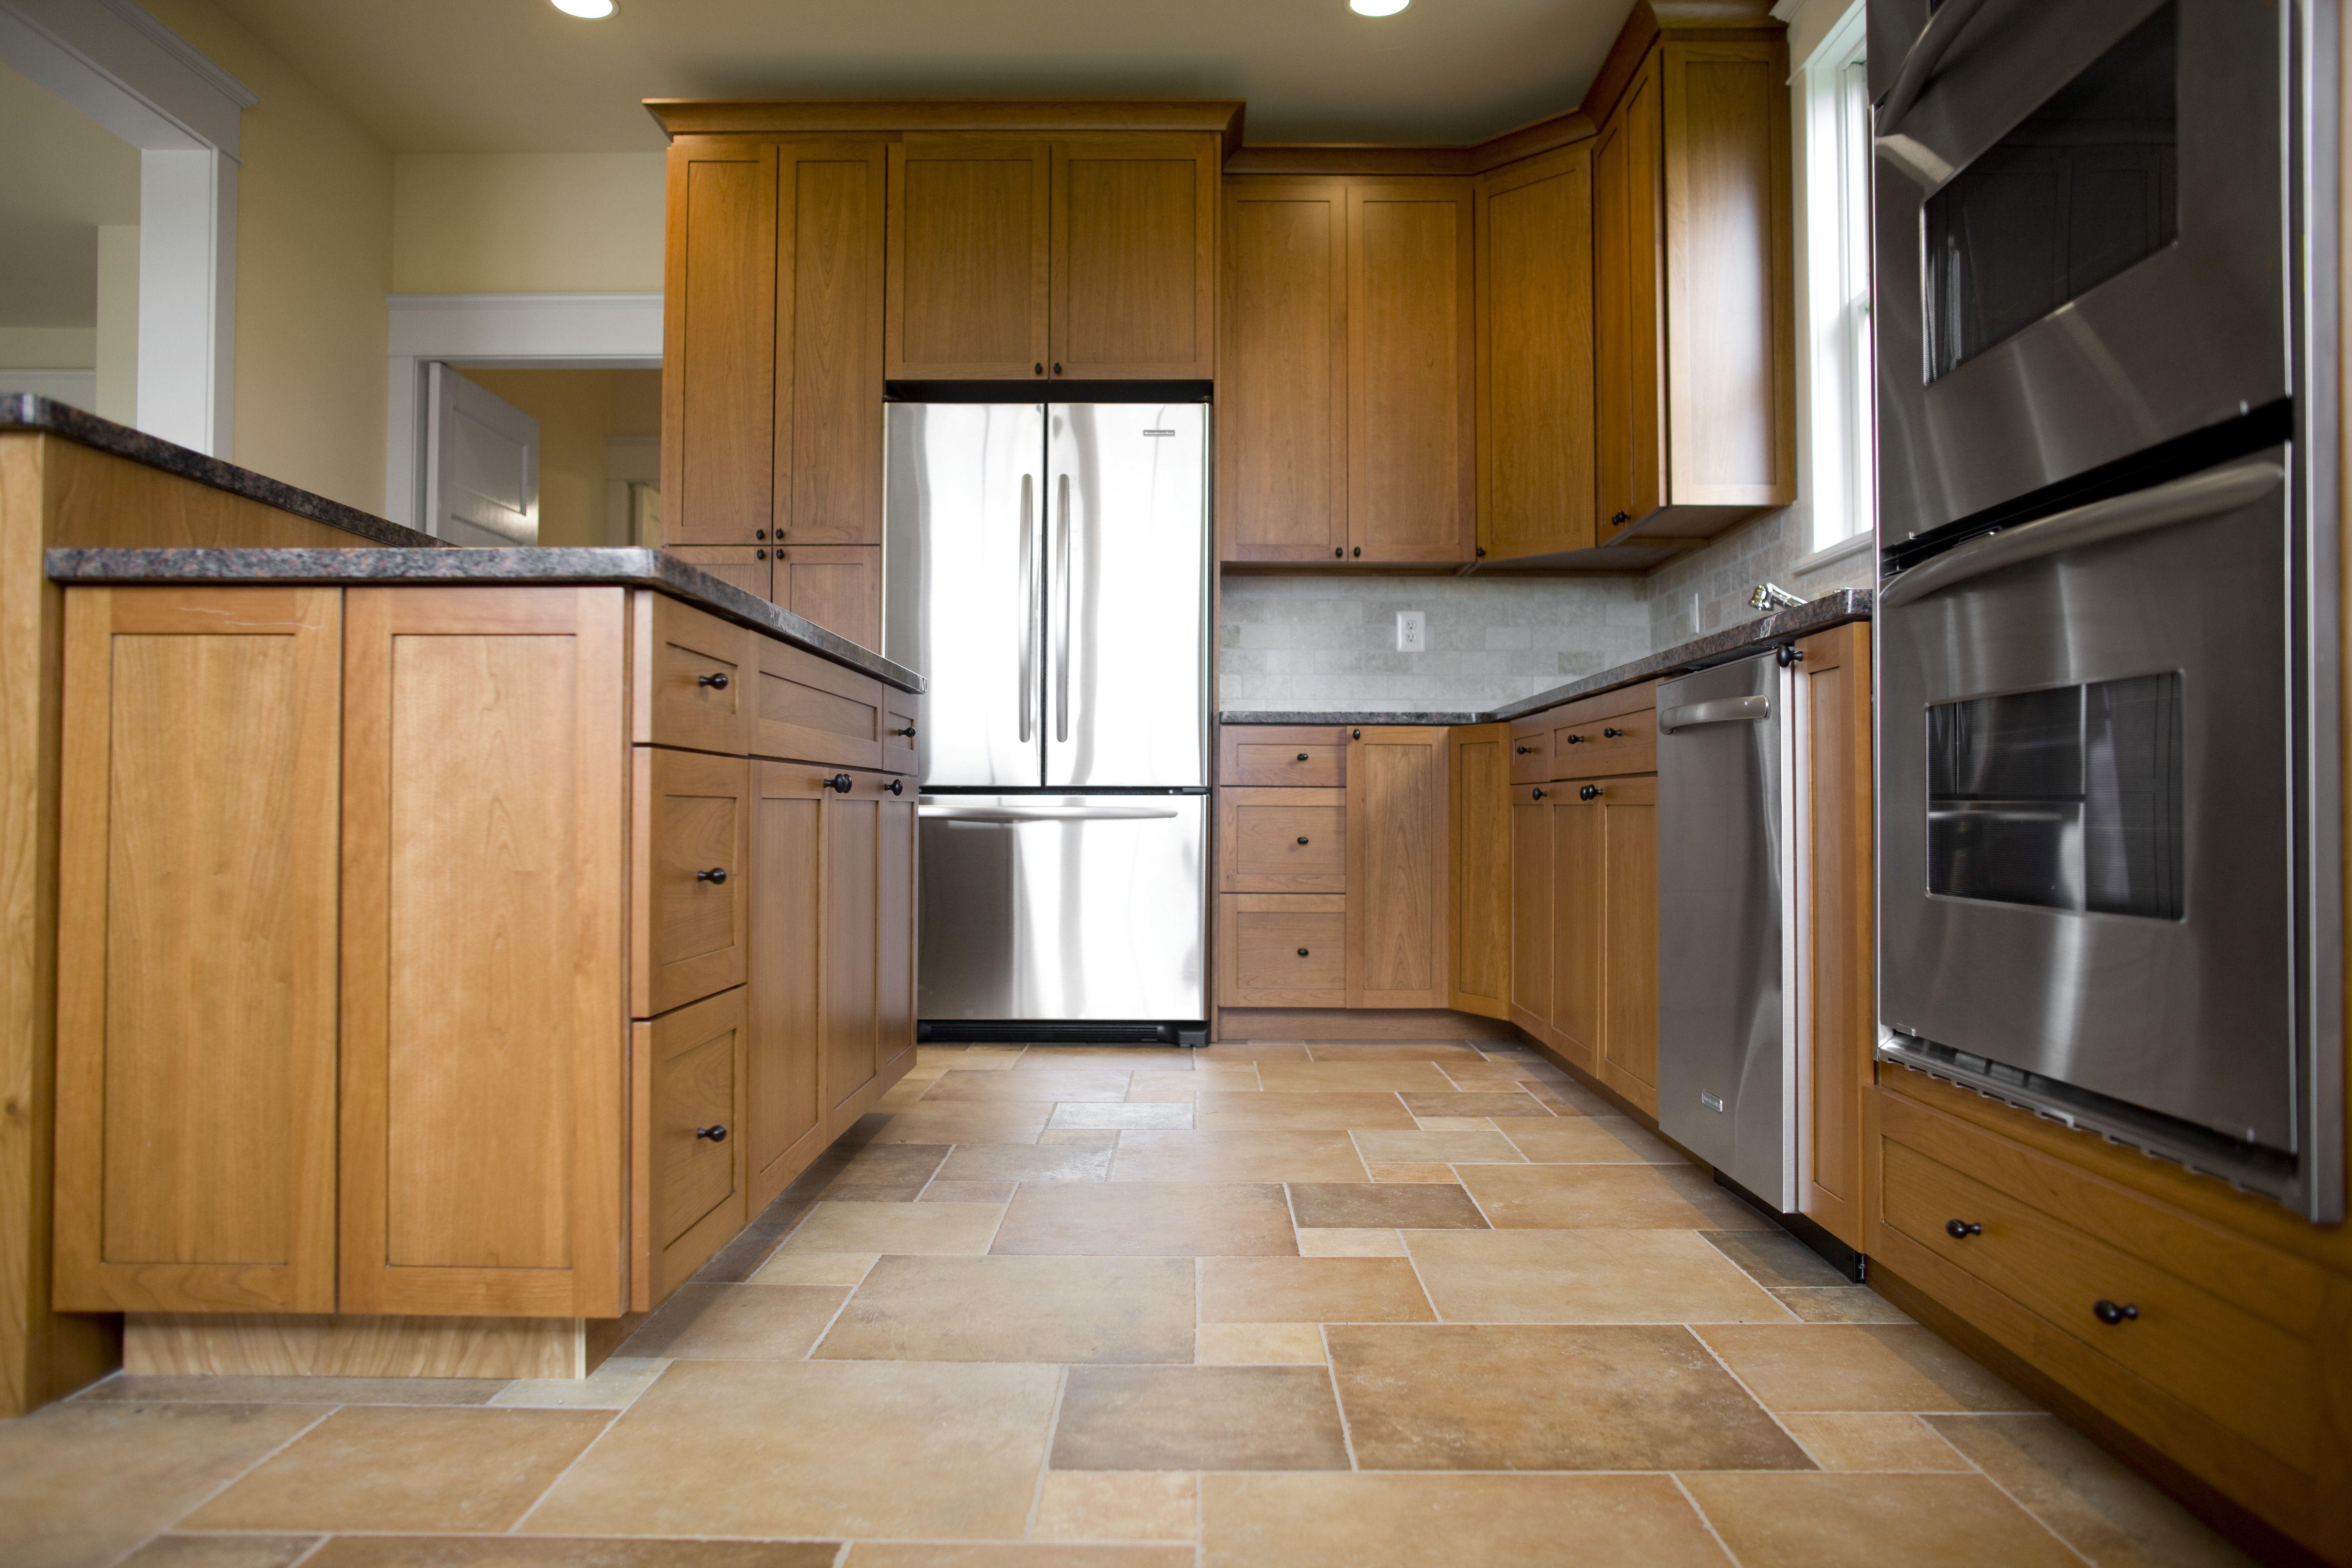 The Best Homemade Tile Grout Cleaner Combines Baking Soda And Hydrogen Peroxide In Equal Par Porcelain Tiles Kitchen Kitchen Flooring Best Flooring For Kitchen